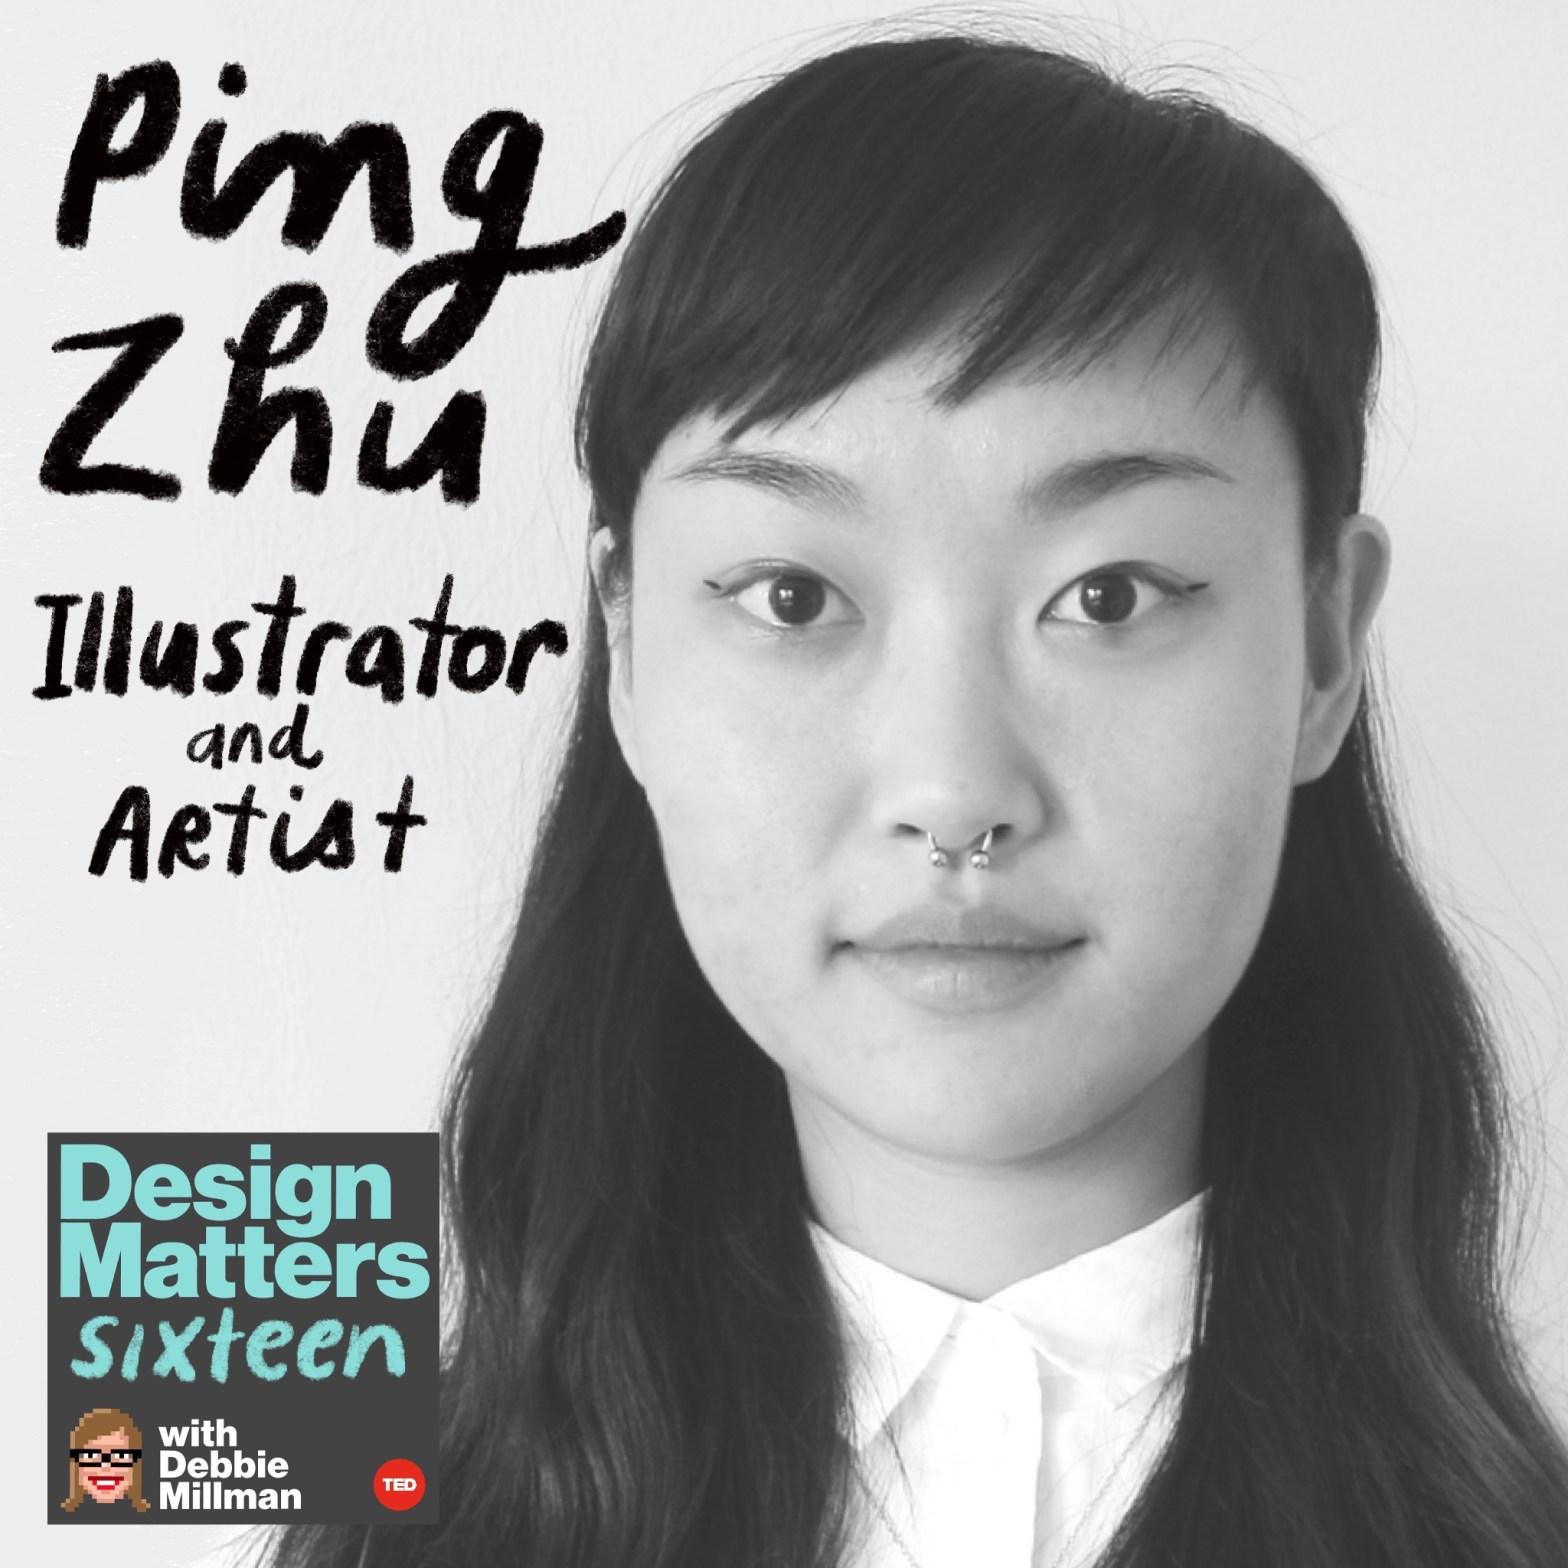 Thumbnail for Design Matters: Ping Zhu